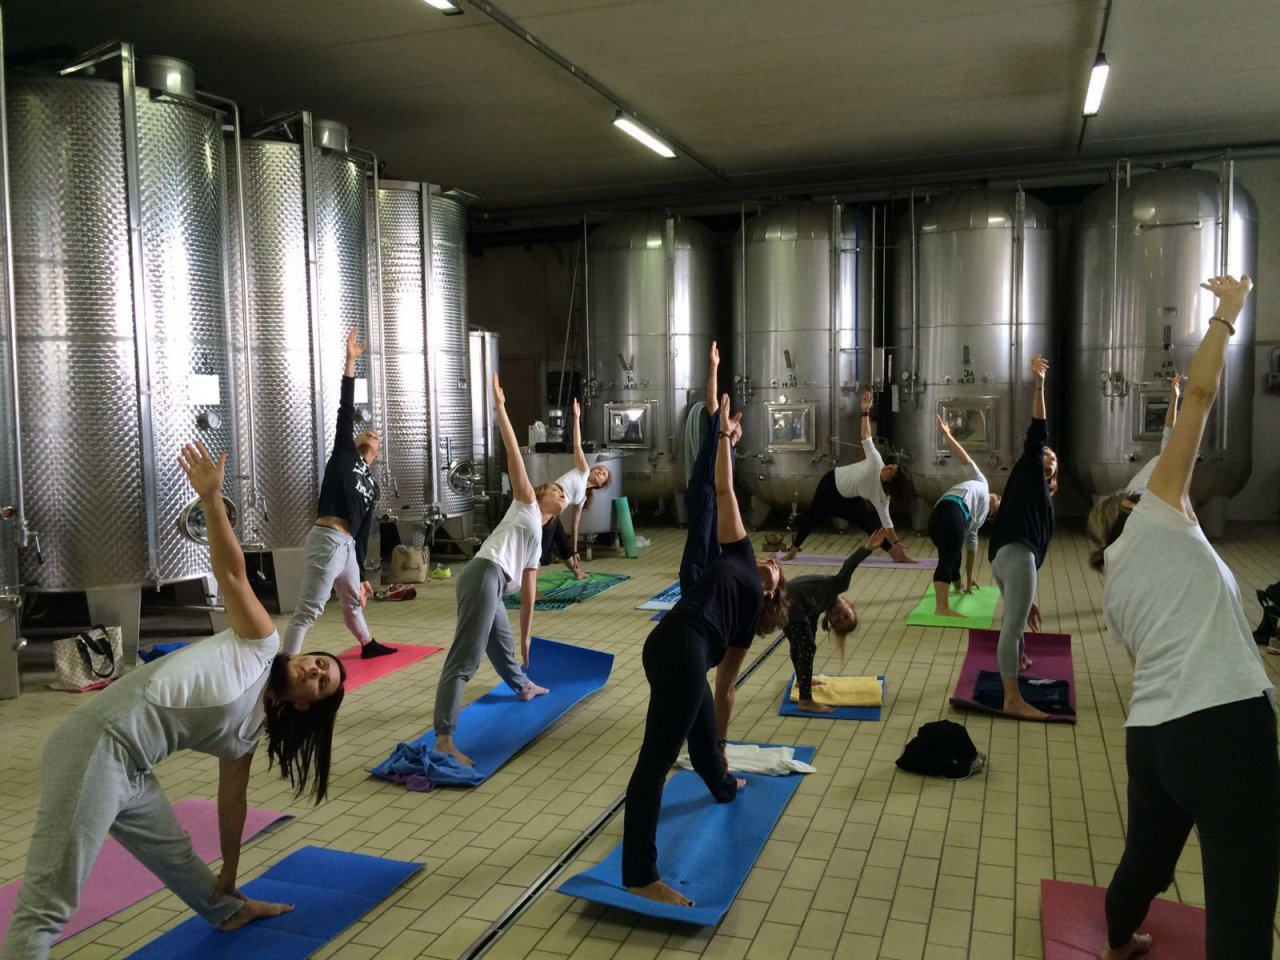 Yoga In Cantina A Valdobbiadene Noi C 39 Eravamo